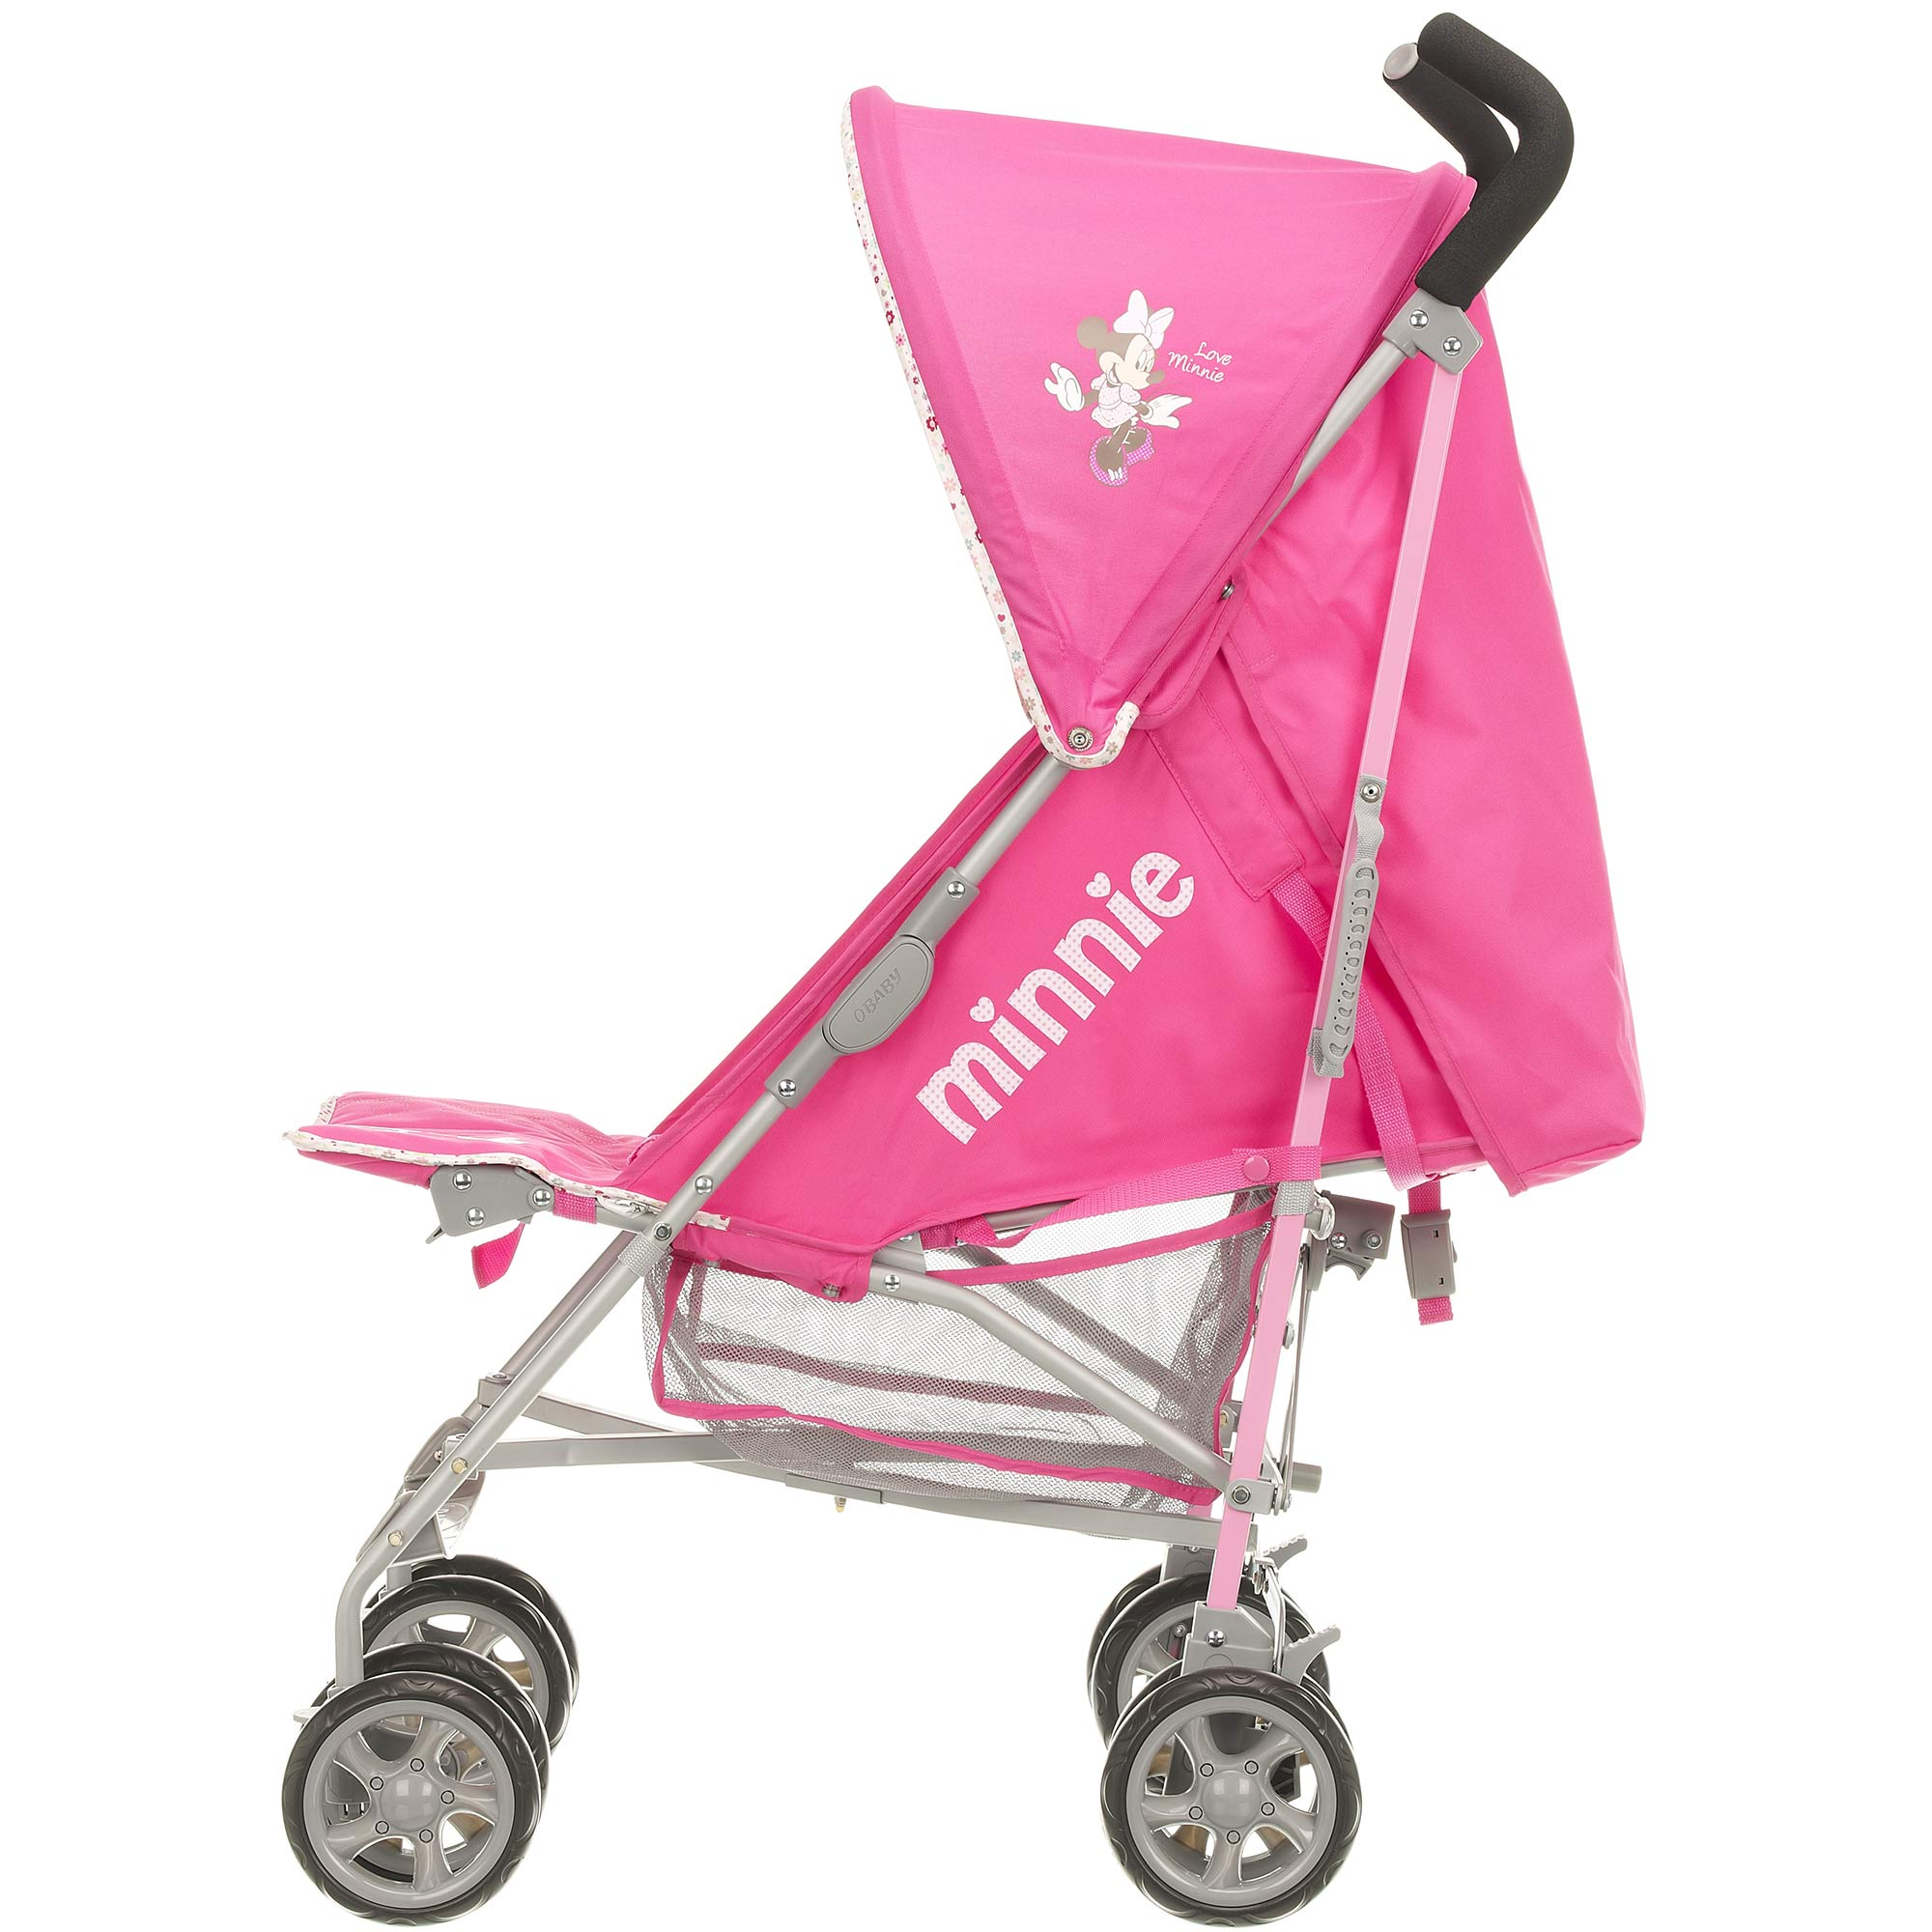 Obaby Disney Stroller Buggy Baby Toddler Child Travel